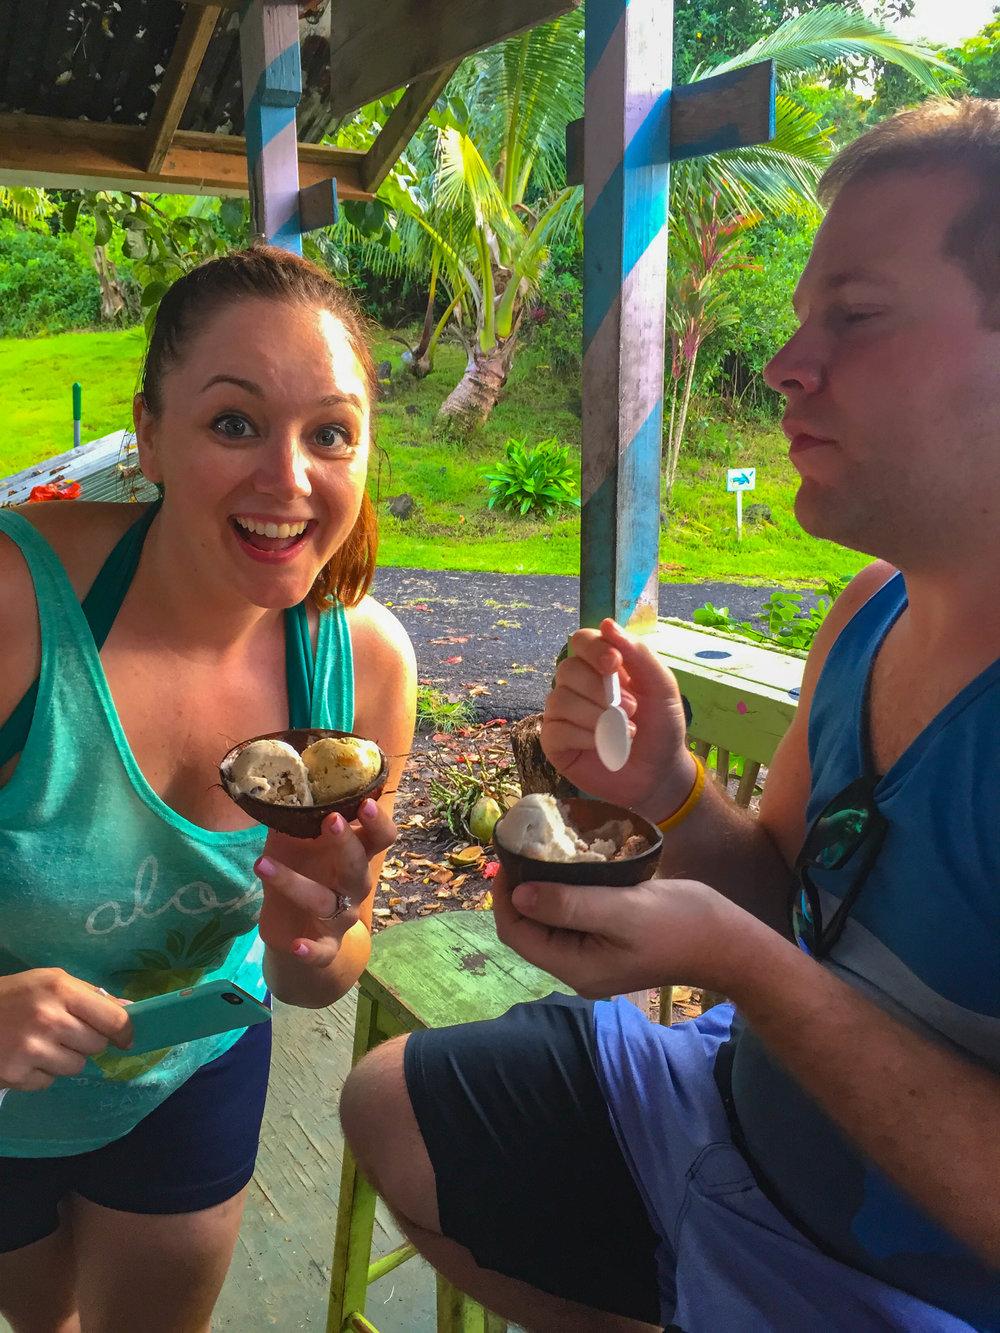 Coconut Glen's Ice Cream - Maui, Hawaii - Road to Hana Flavors